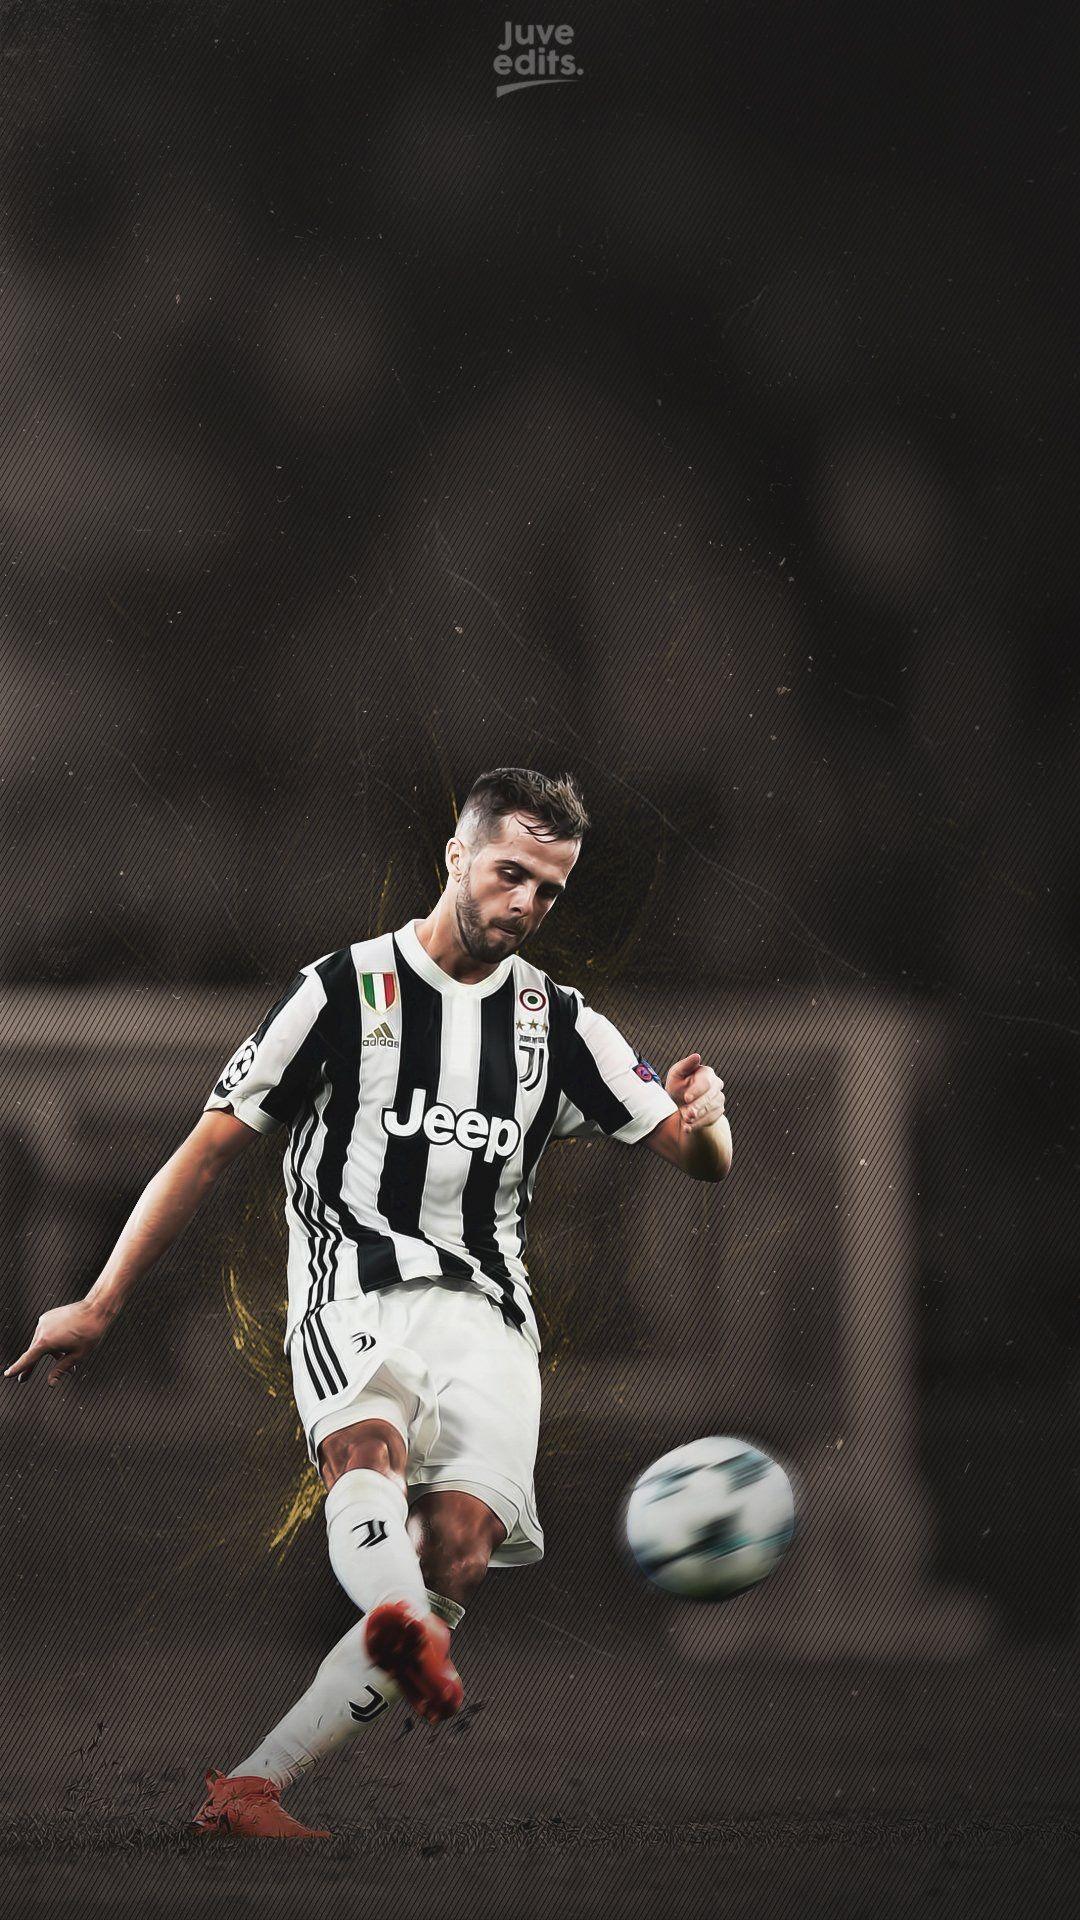 Pin di 𝚞𝚟 su Juventus Calcio